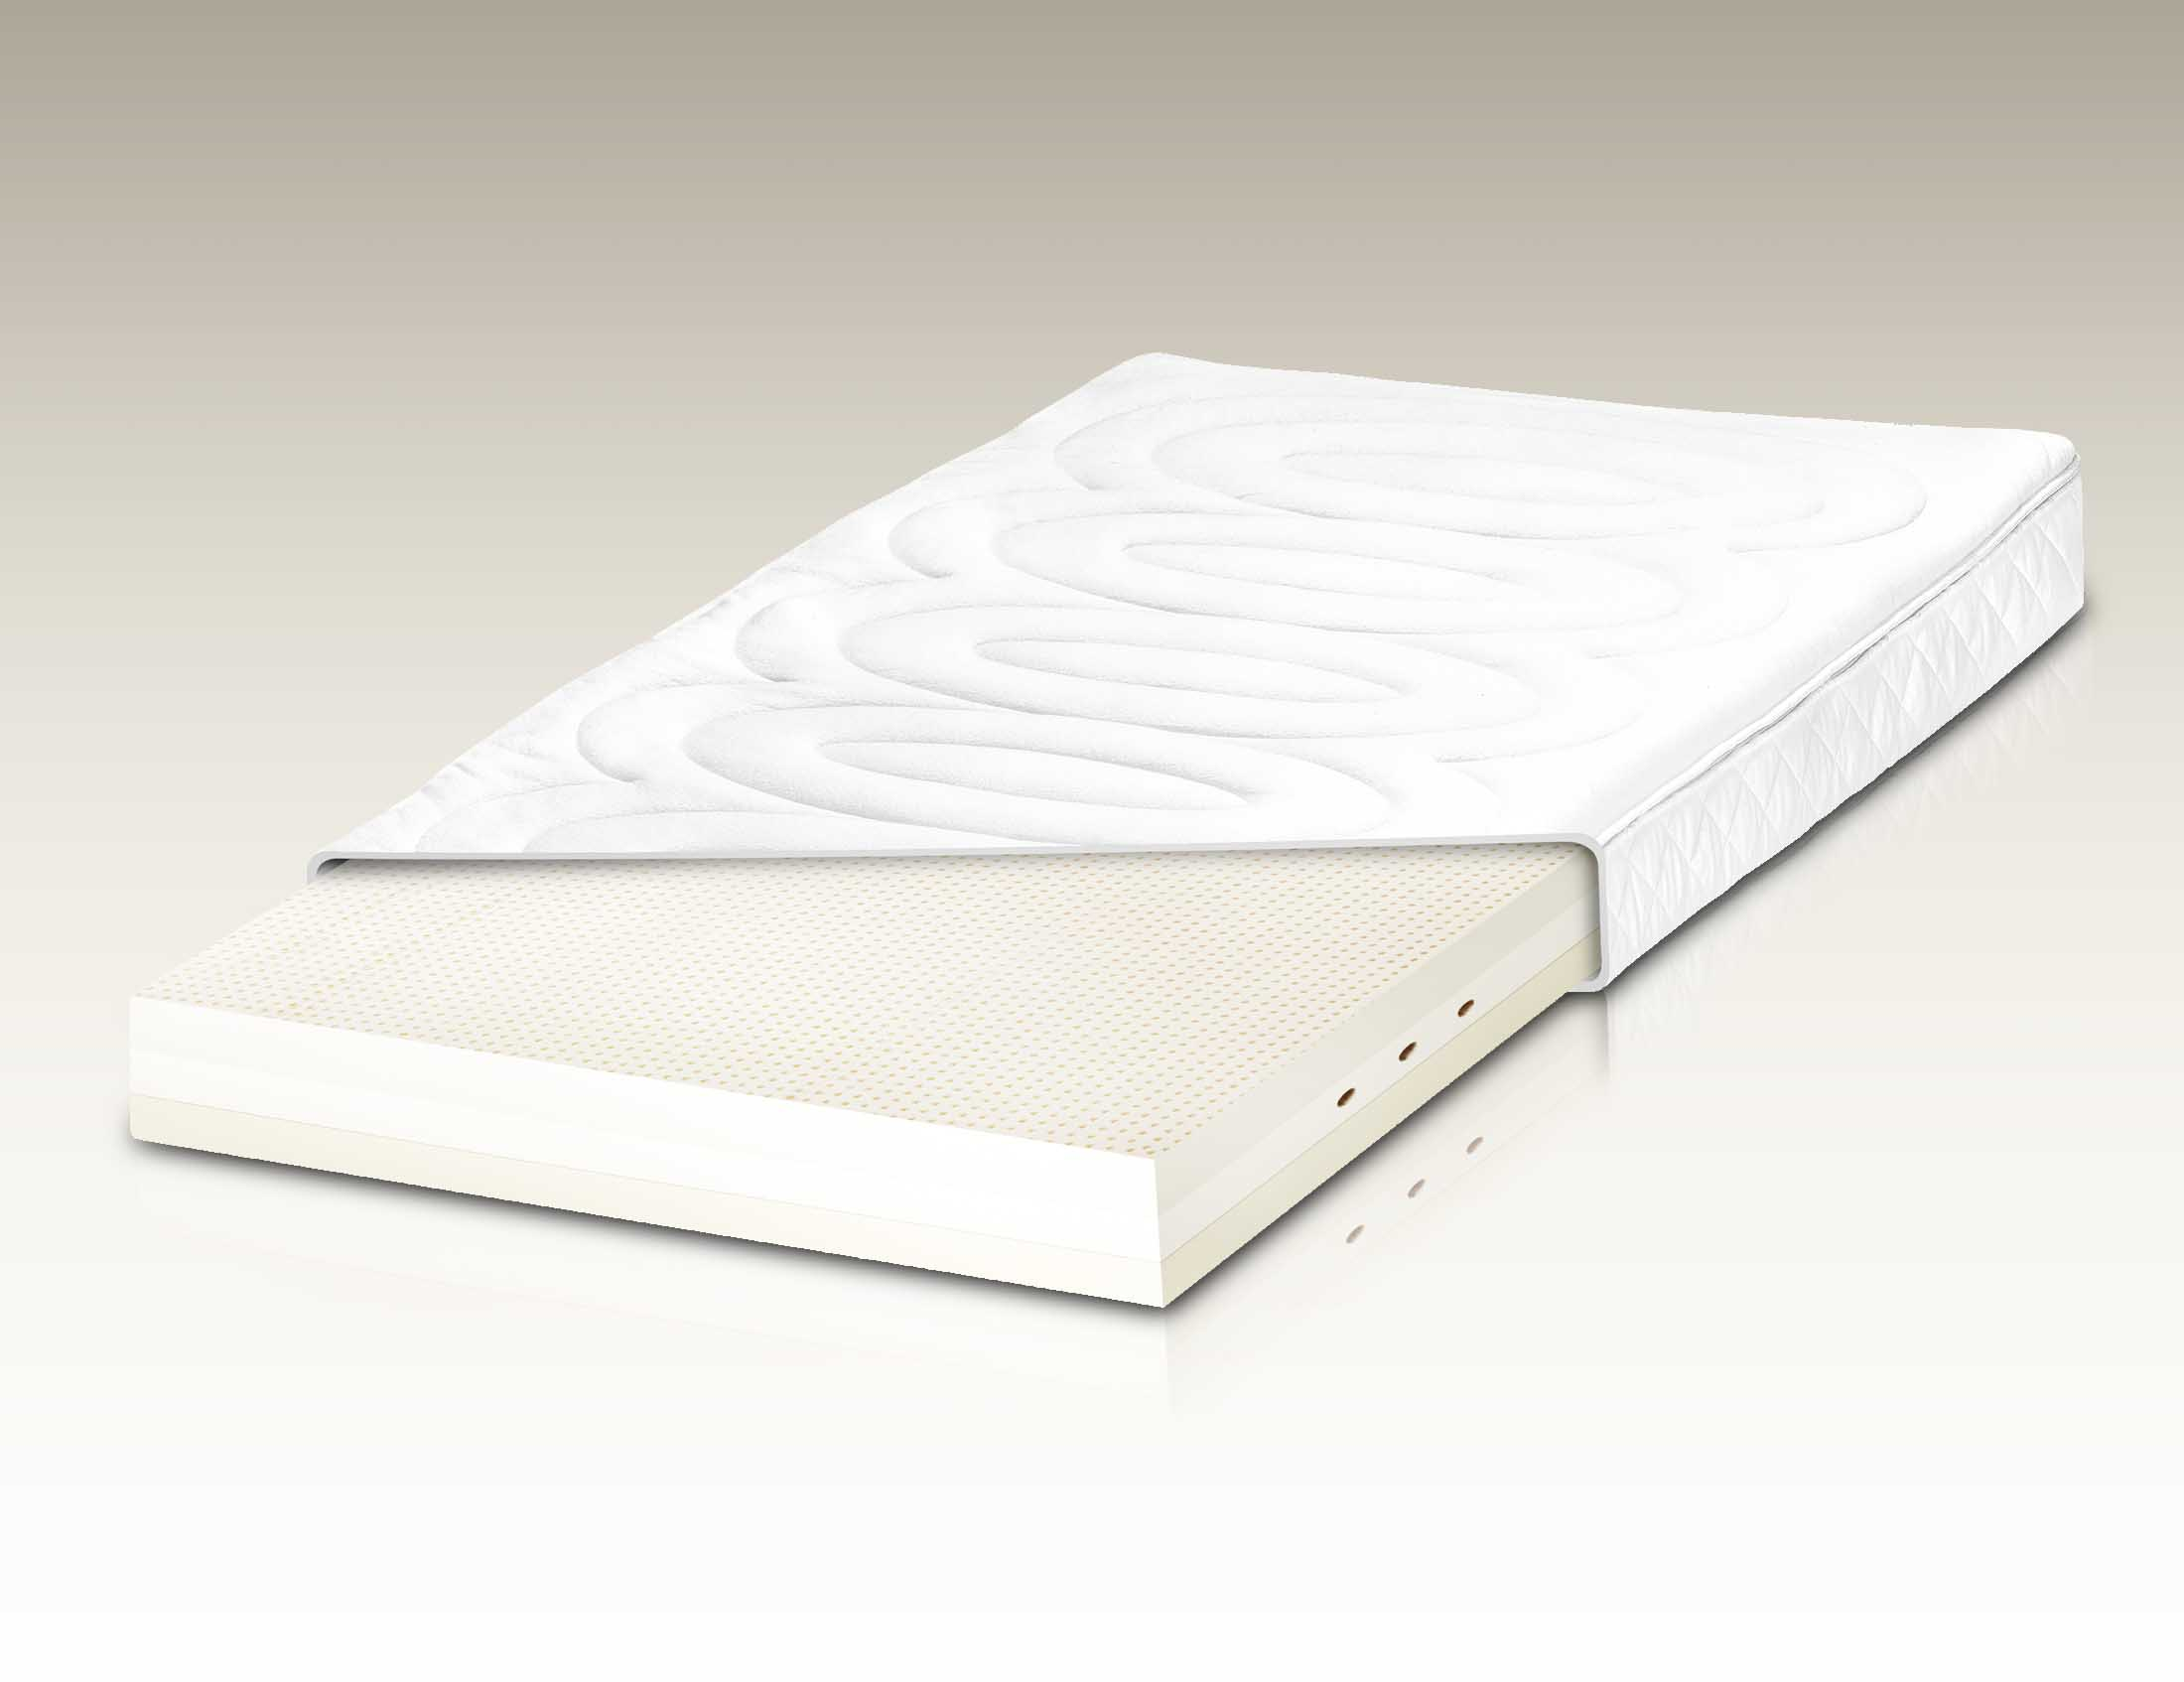 h sler nest naturlatex matratze 2flex 13 cm deluxe. Black Bedroom Furniture Sets. Home Design Ideas